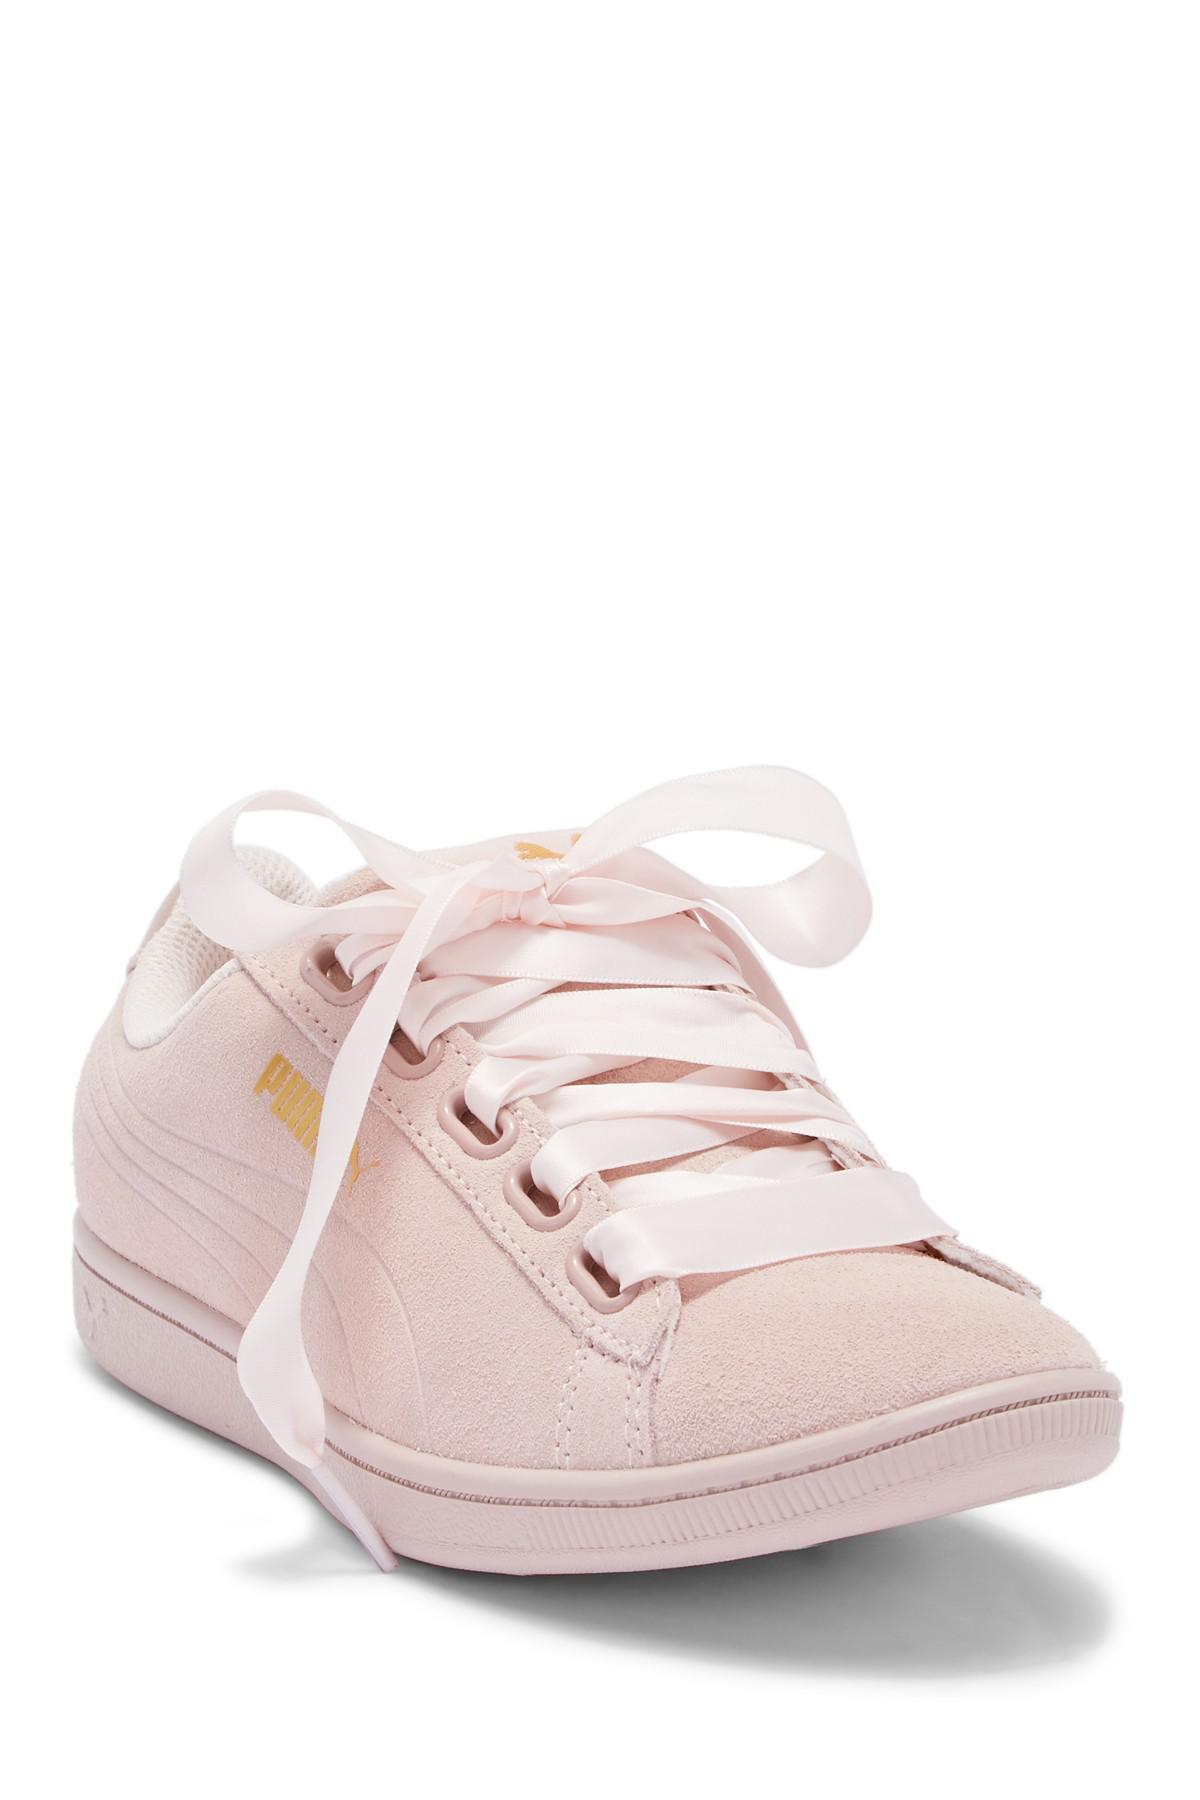 2cd6d9b07ed Puma Vikky Ribbon Suede Sneaker in White - Lyst